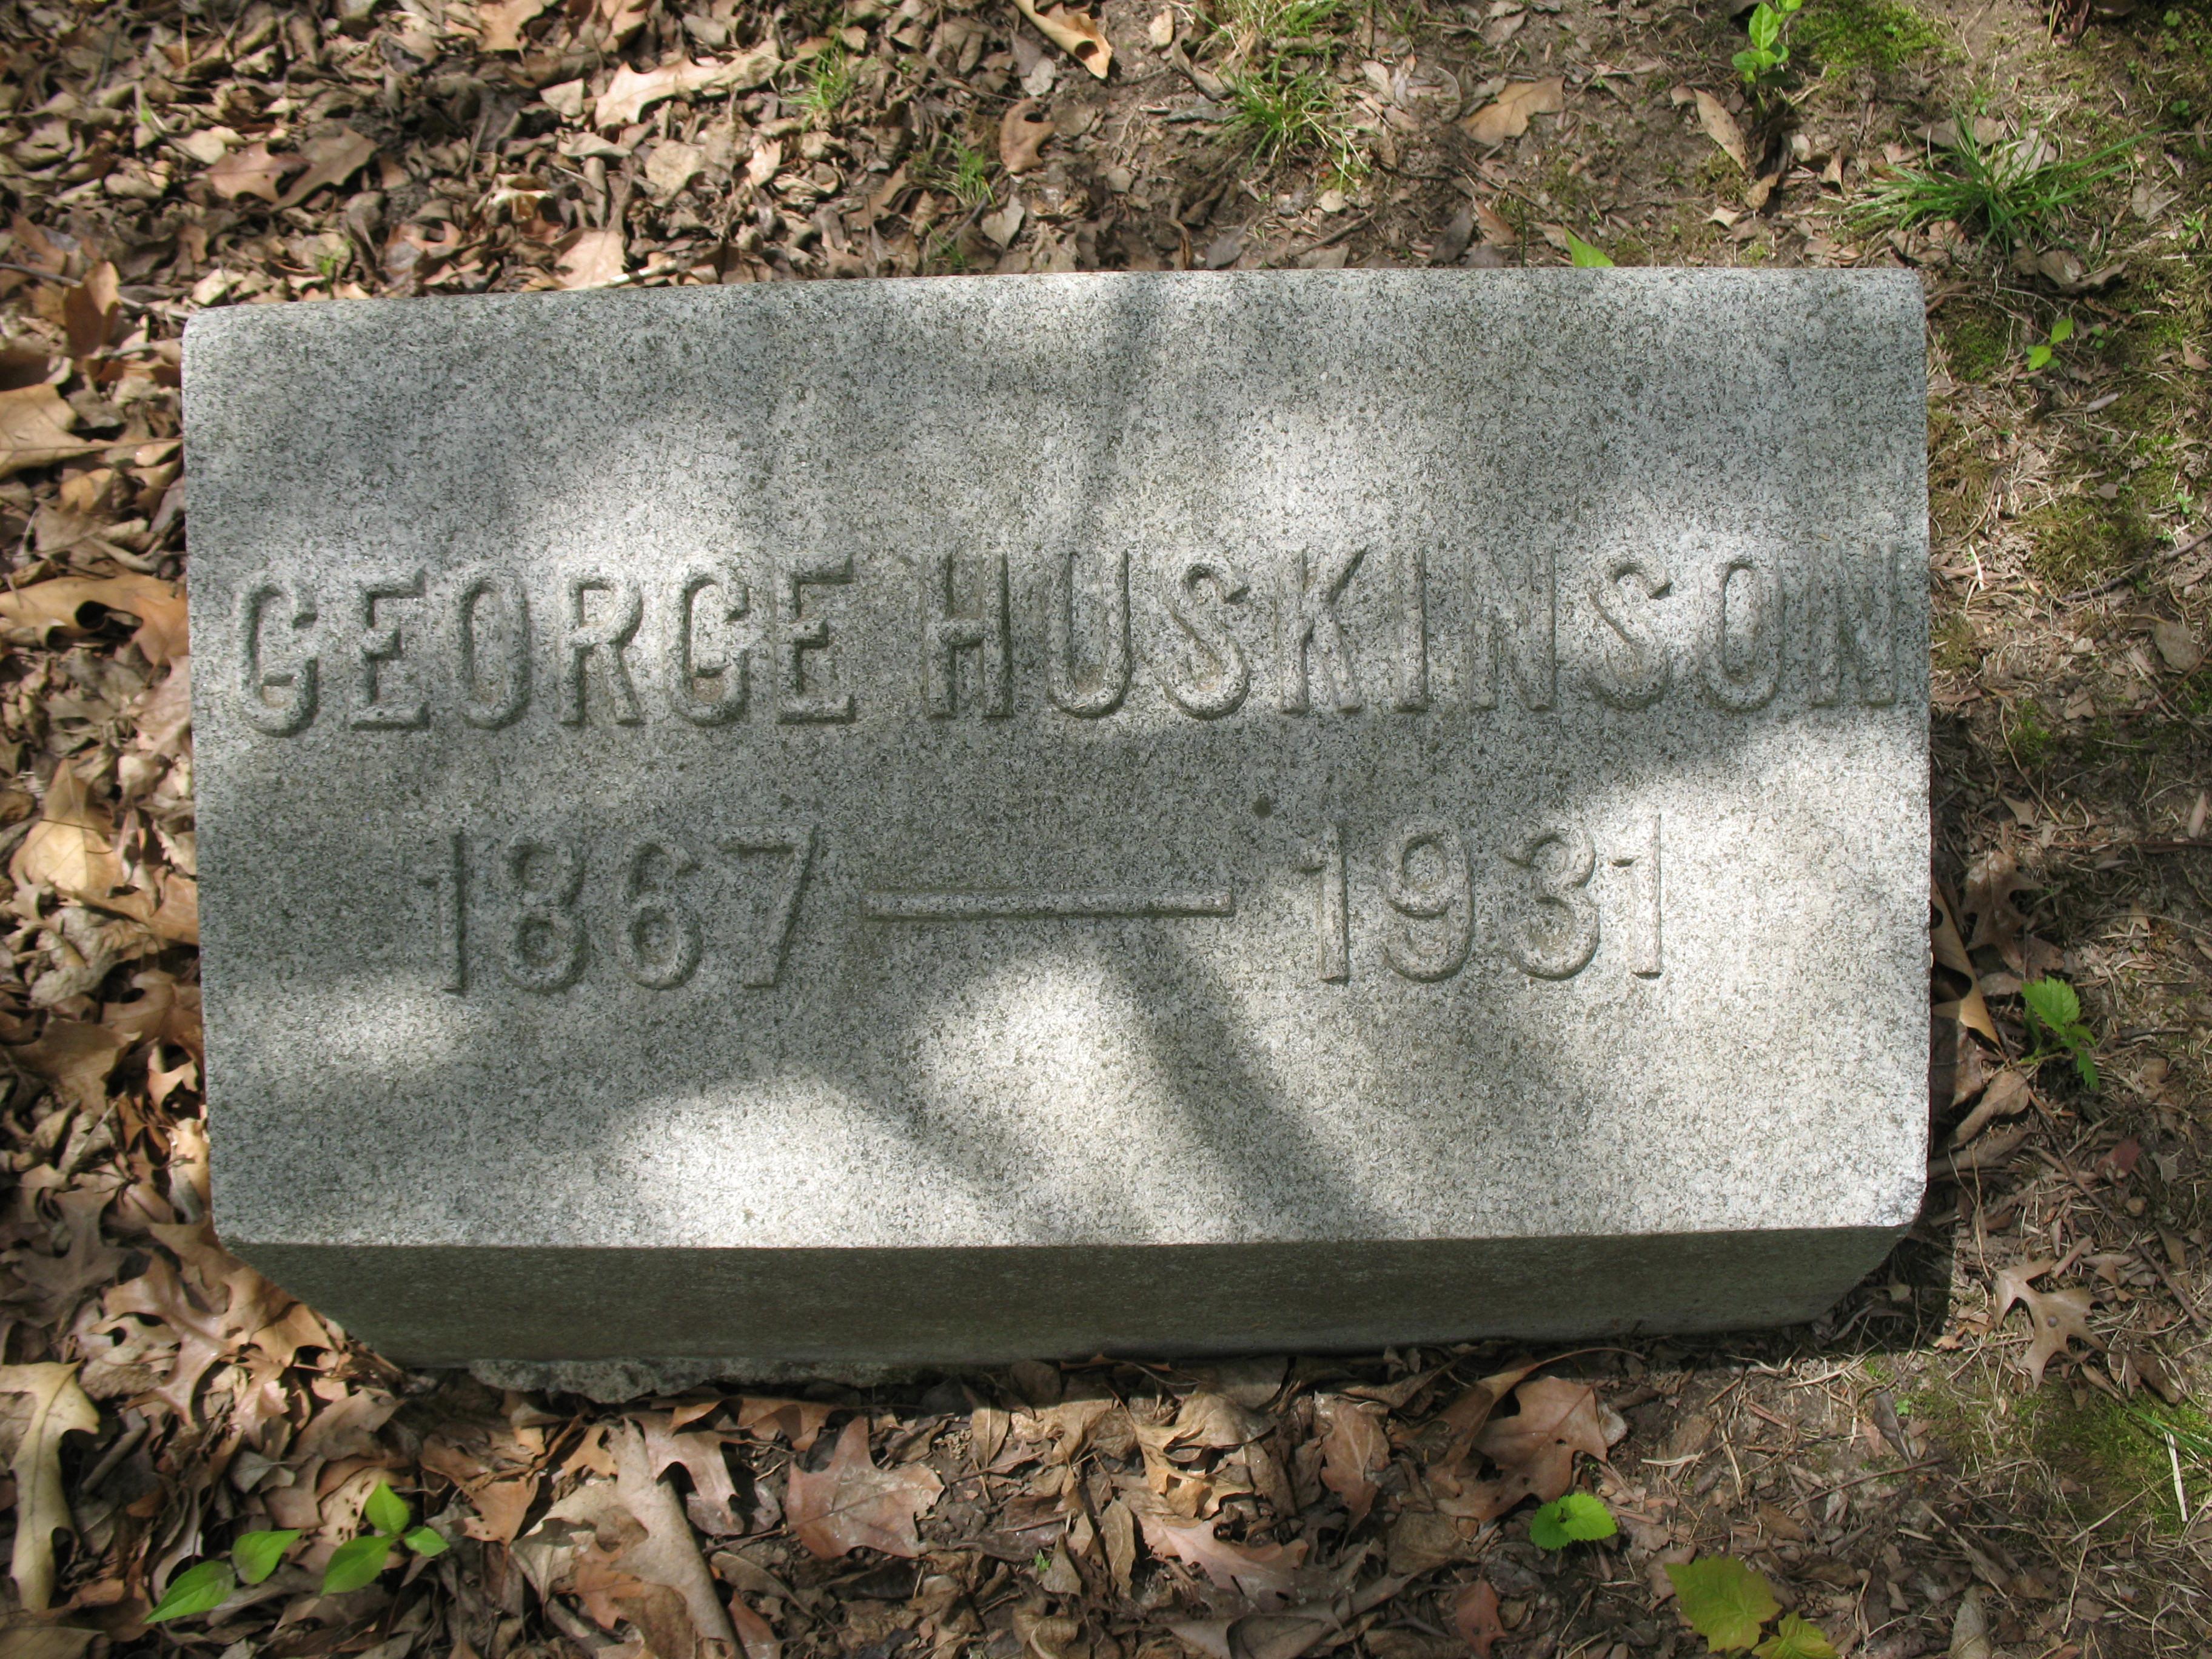 George W. H. Huskinson